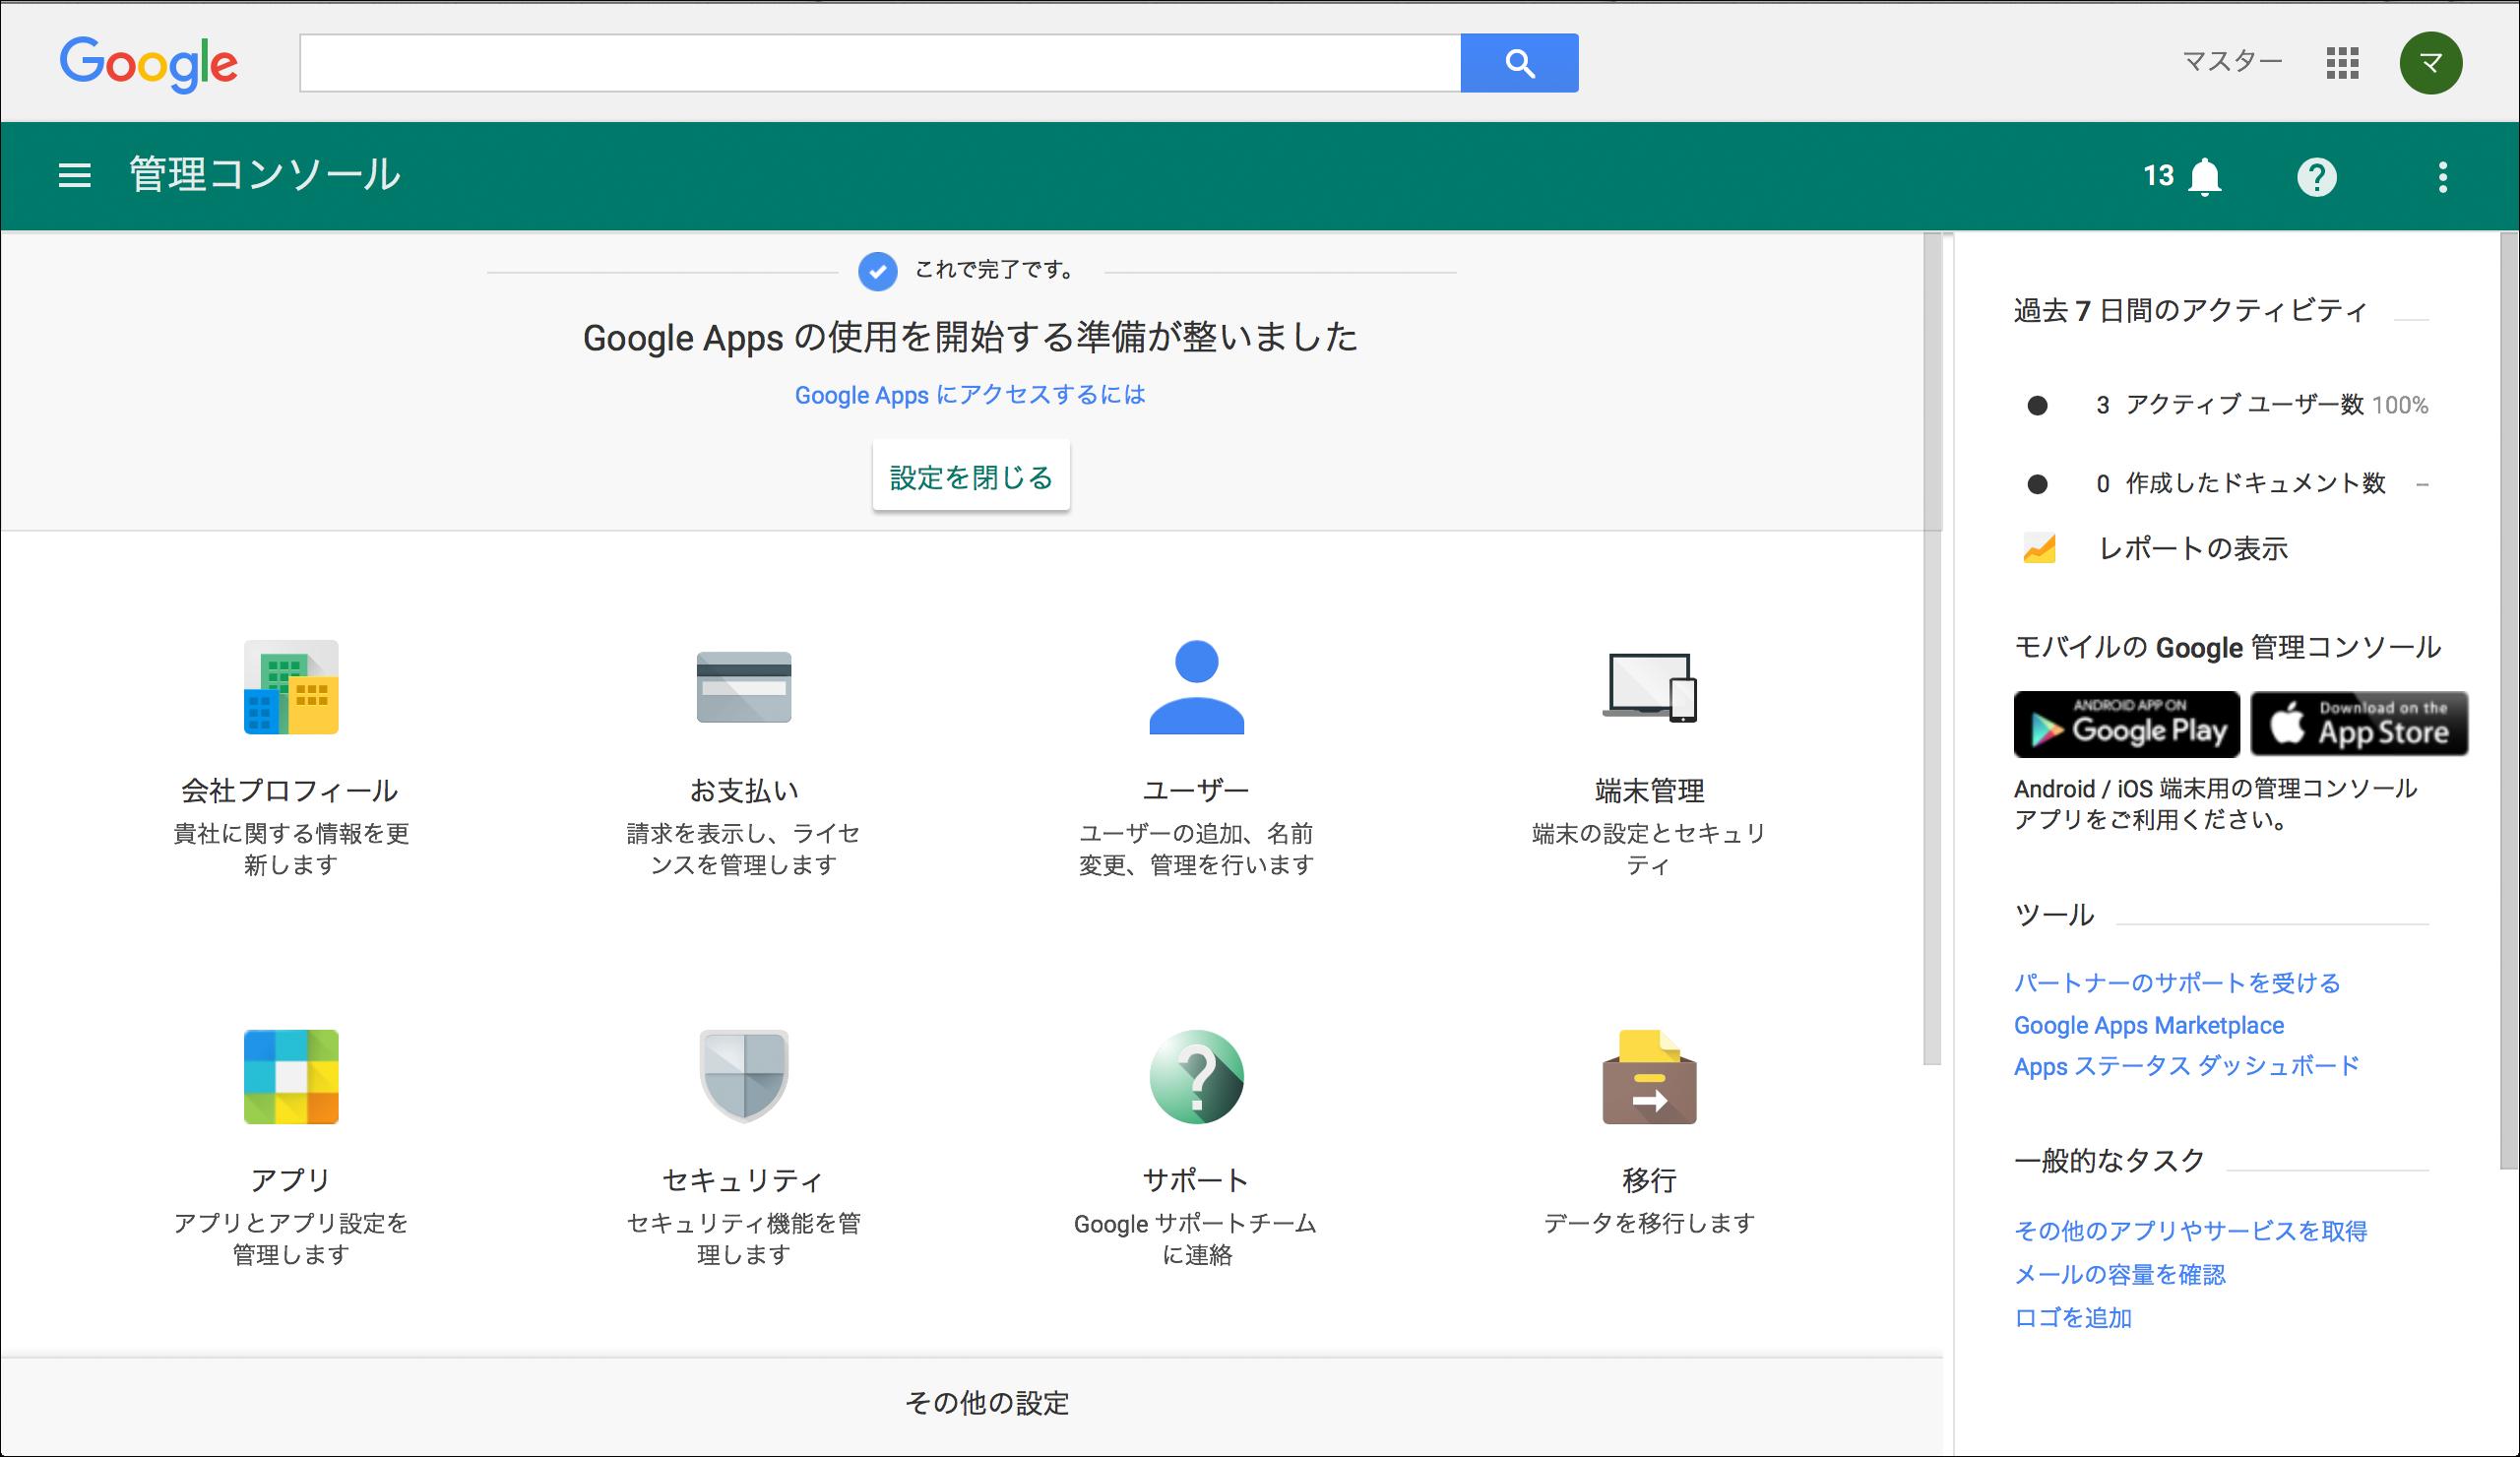 """GoogleApps""/"